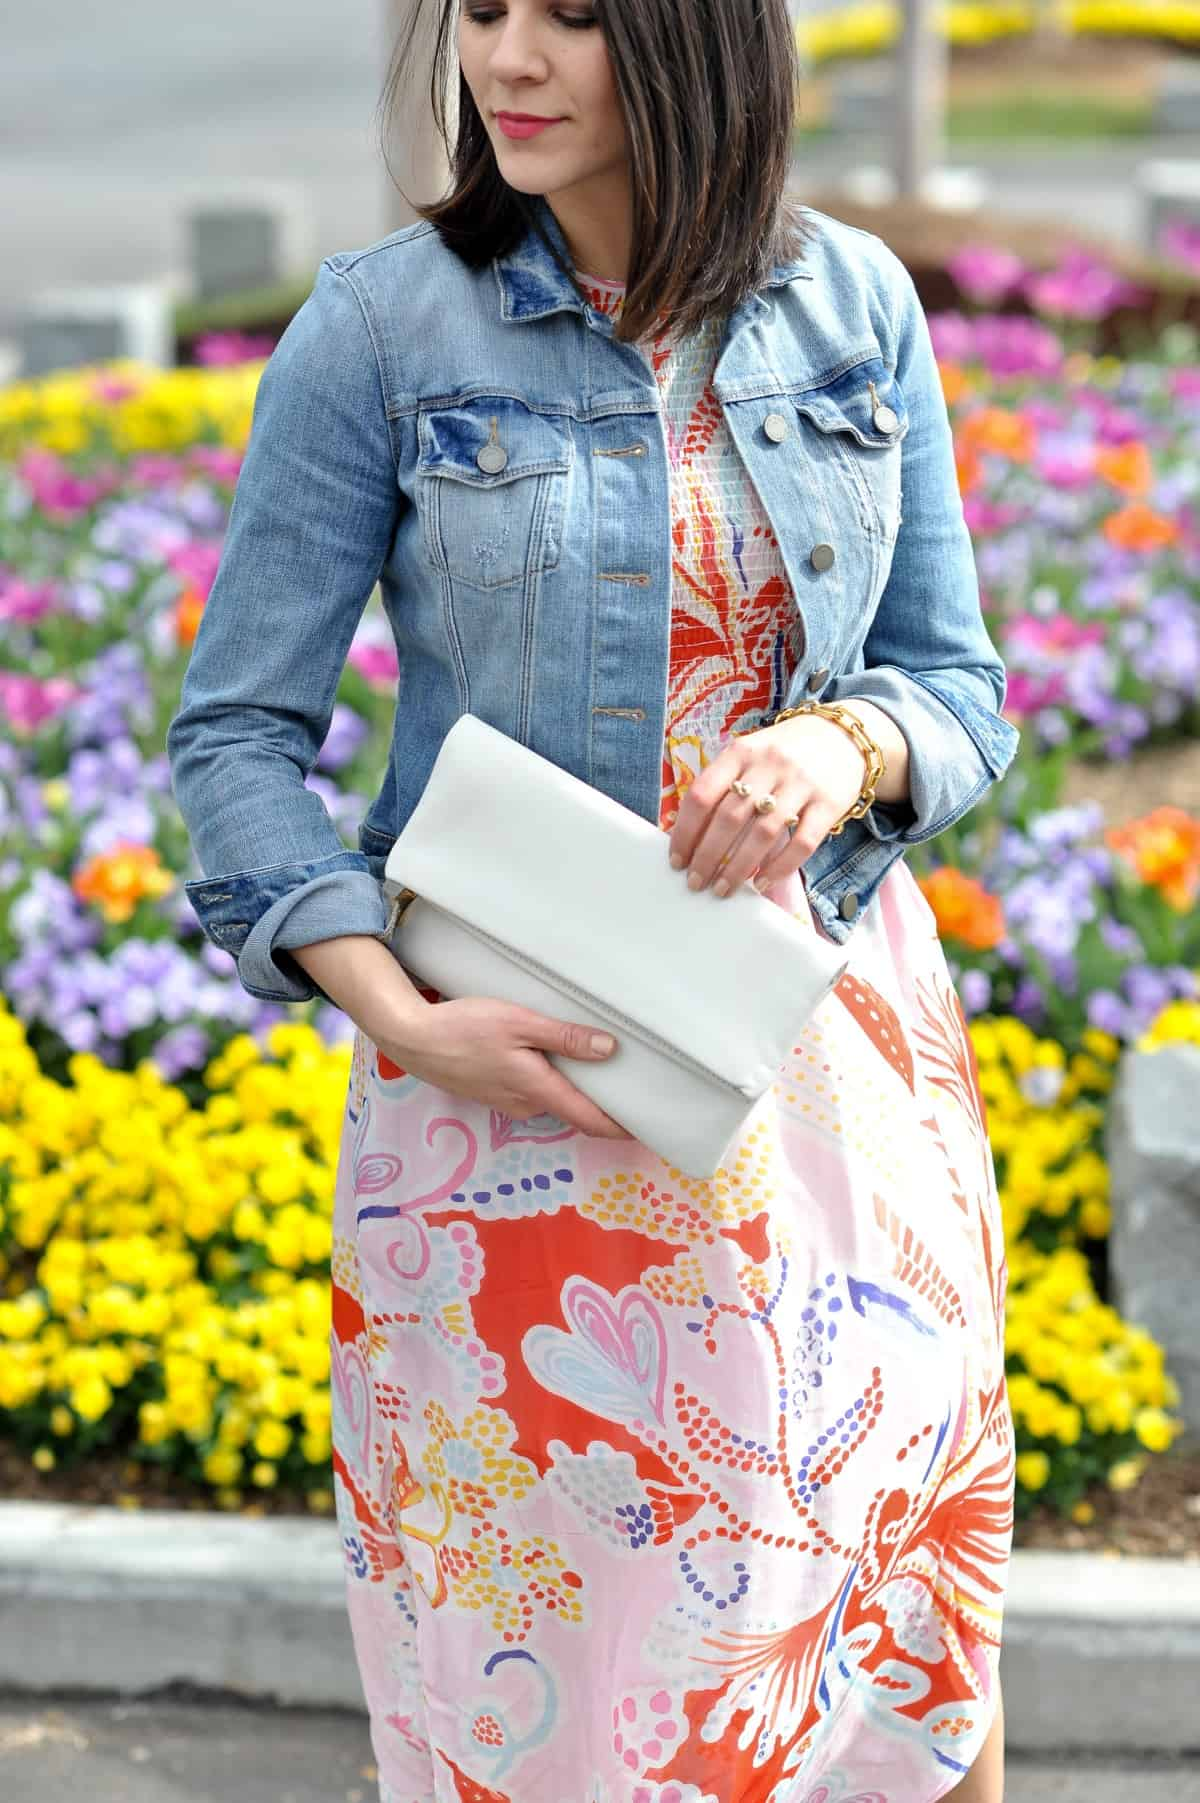 Banjanan Cochella Dress - printed floral dress for summer - My Style Vita - @mystylevita - 18